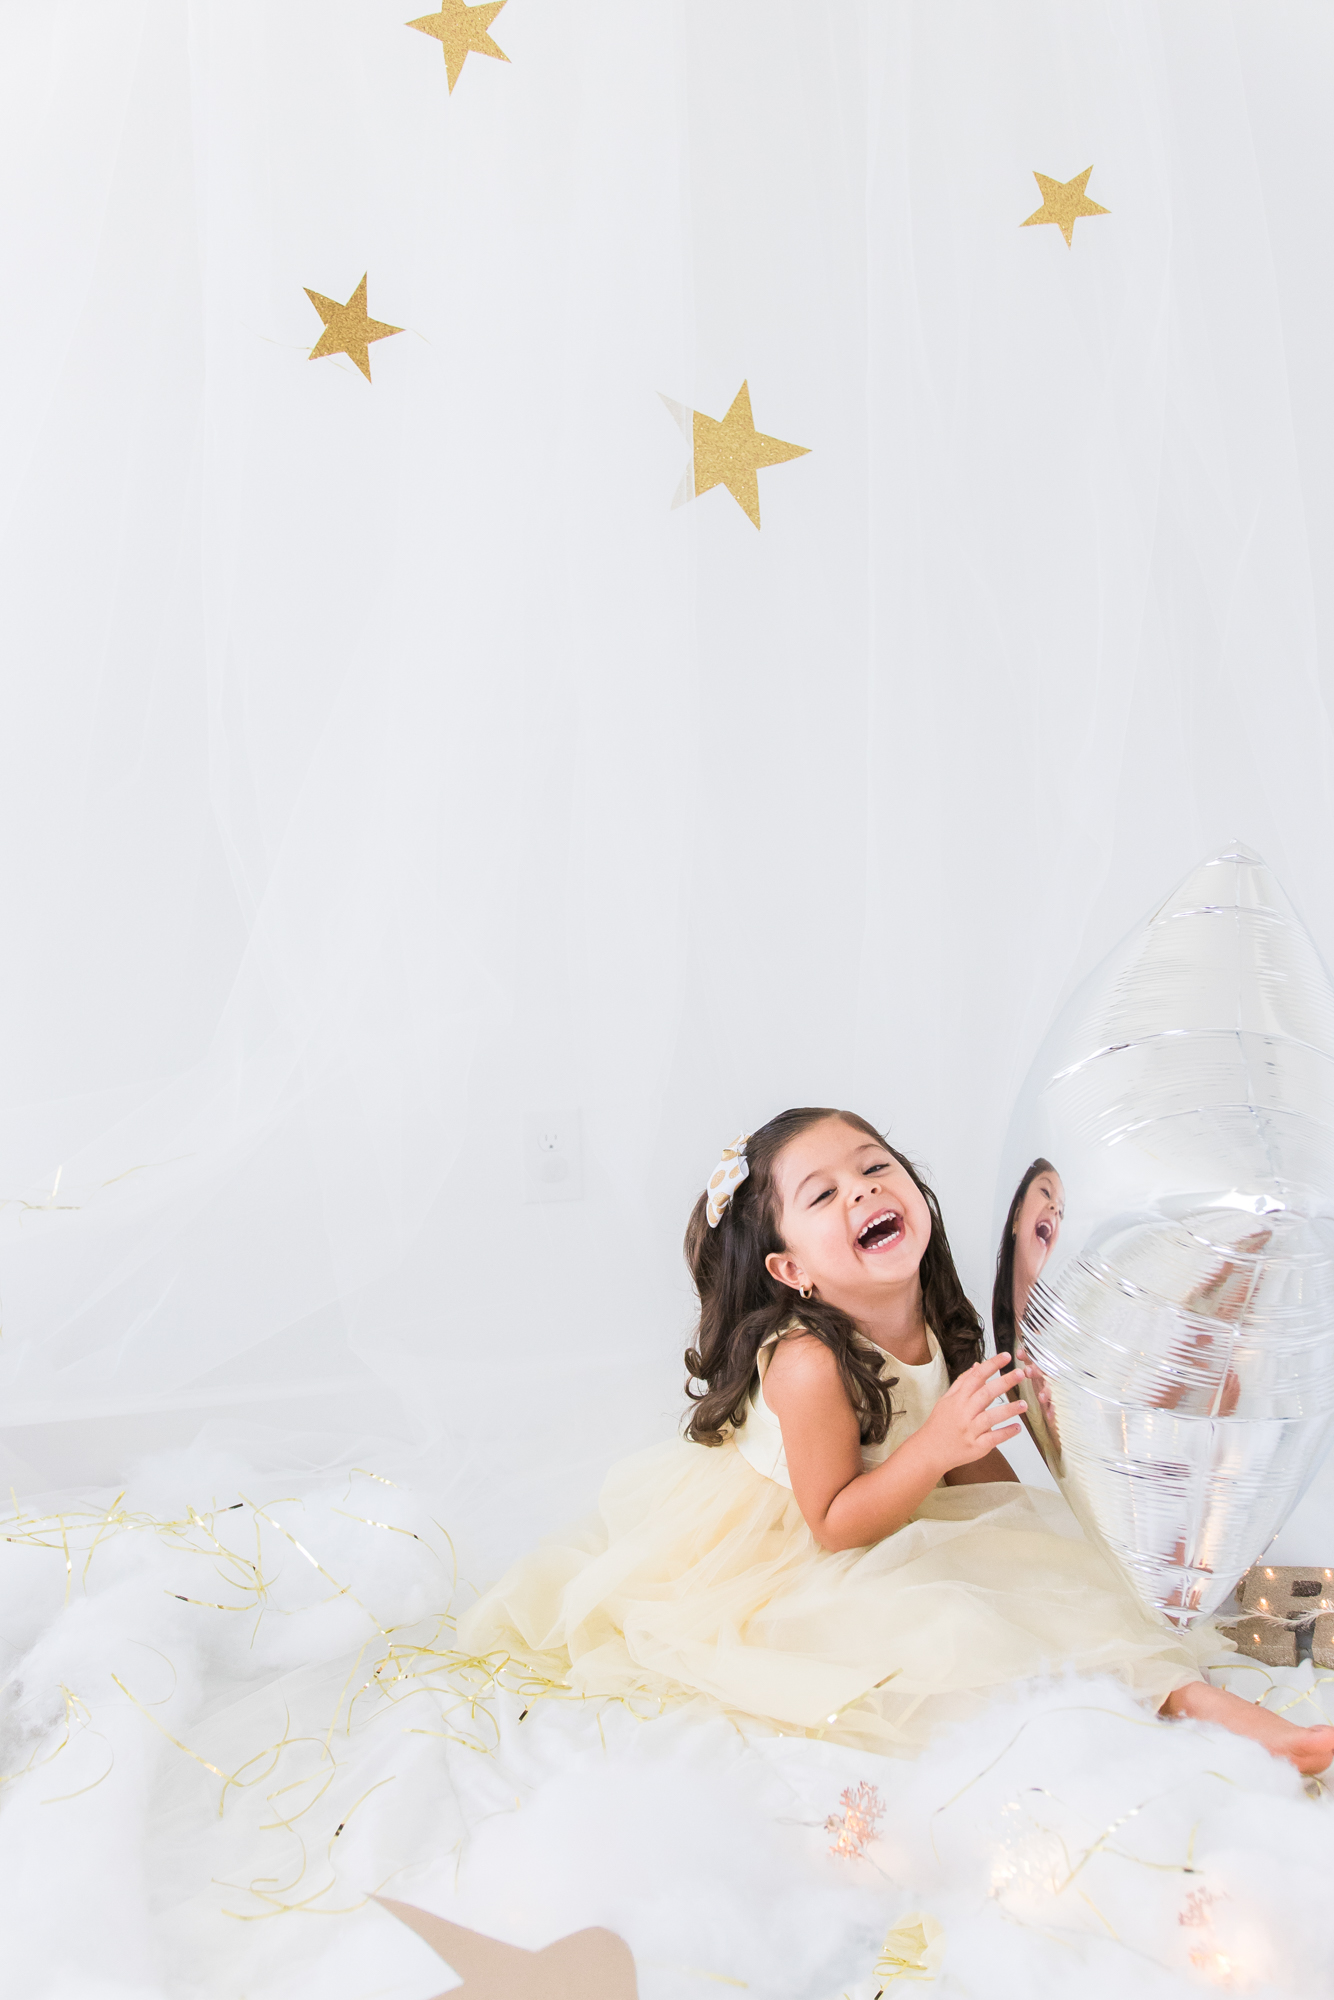 Twinkle-twinkle-little-star-girl-photo-session